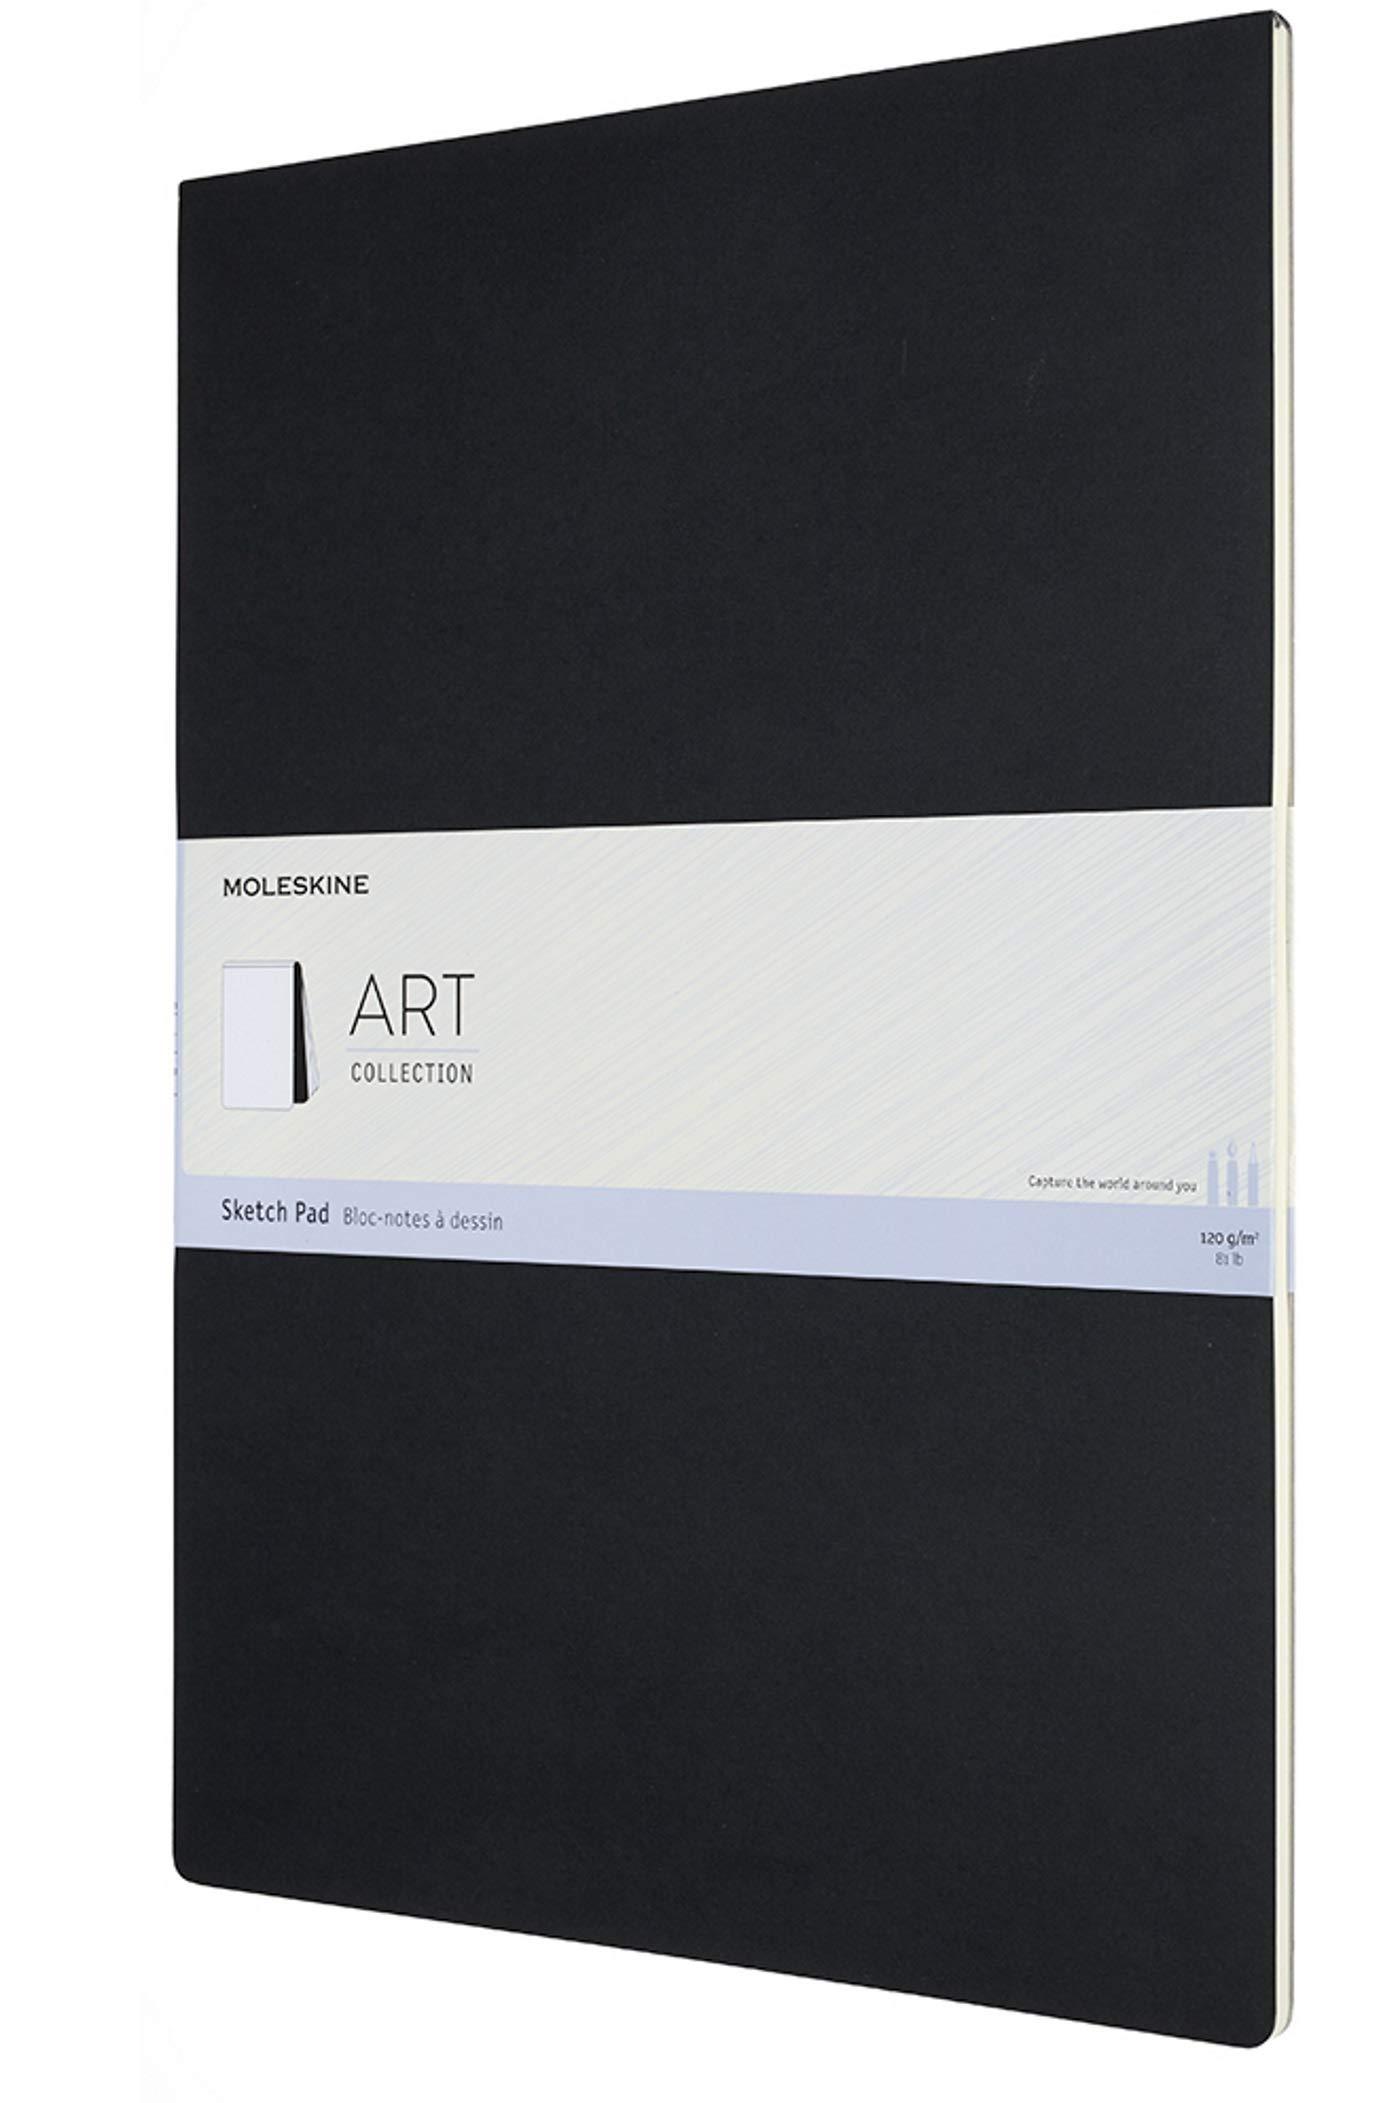 "Moleskine Art Sketch Pad, Soft Cover, A3 (11.75"" x 16.5"") Plain/Blank, Black, 48 Pages"